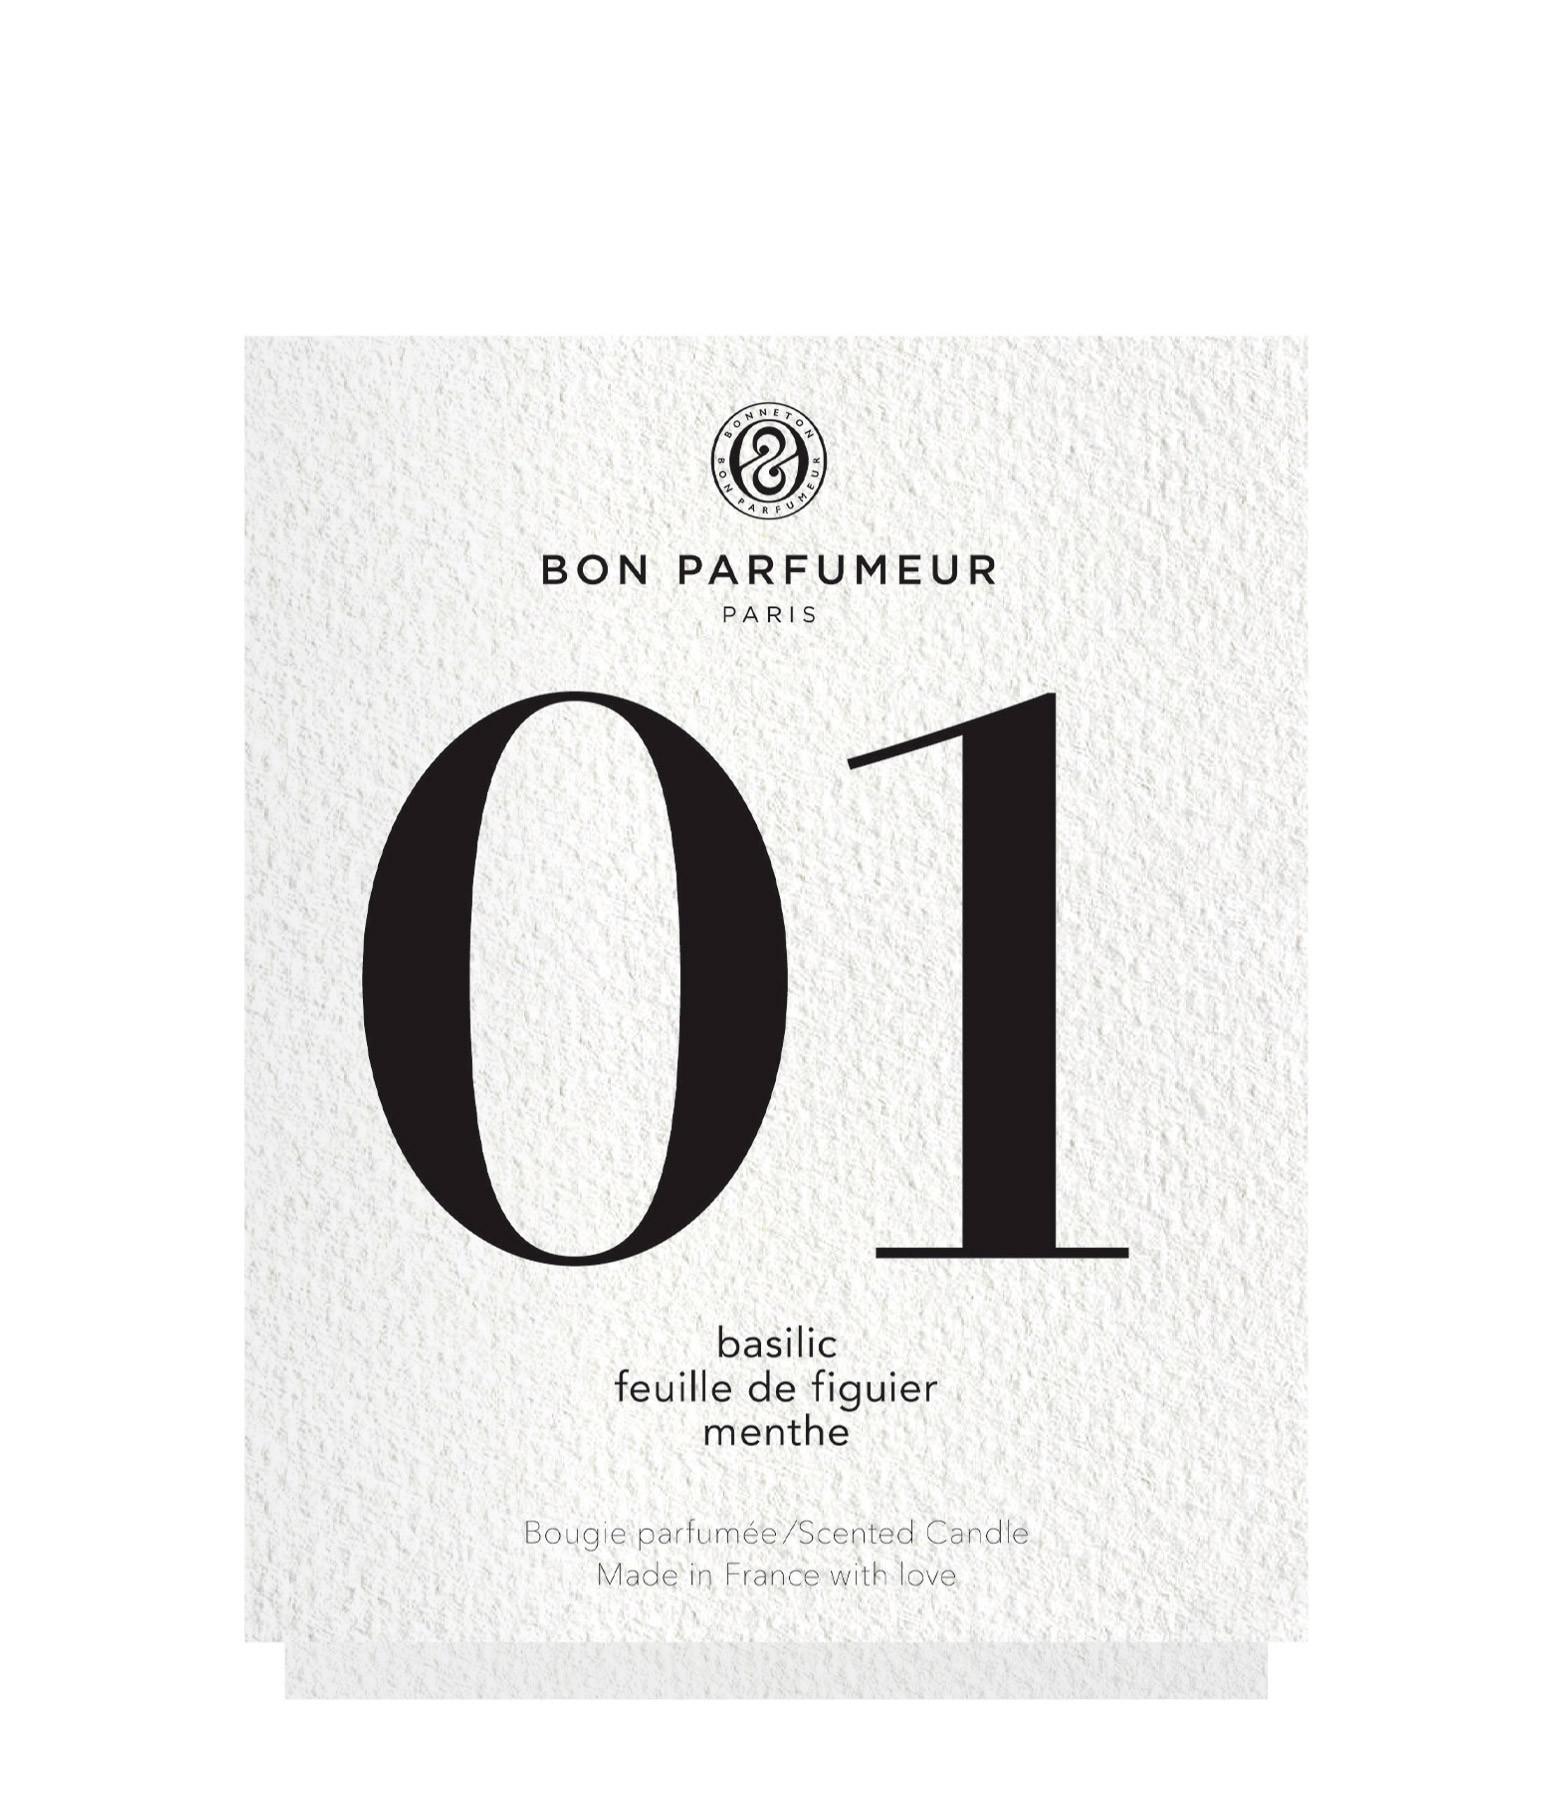 BON PARFUMEUR - Bougie #01 Basilic, Feuille de Figuier, Menthe